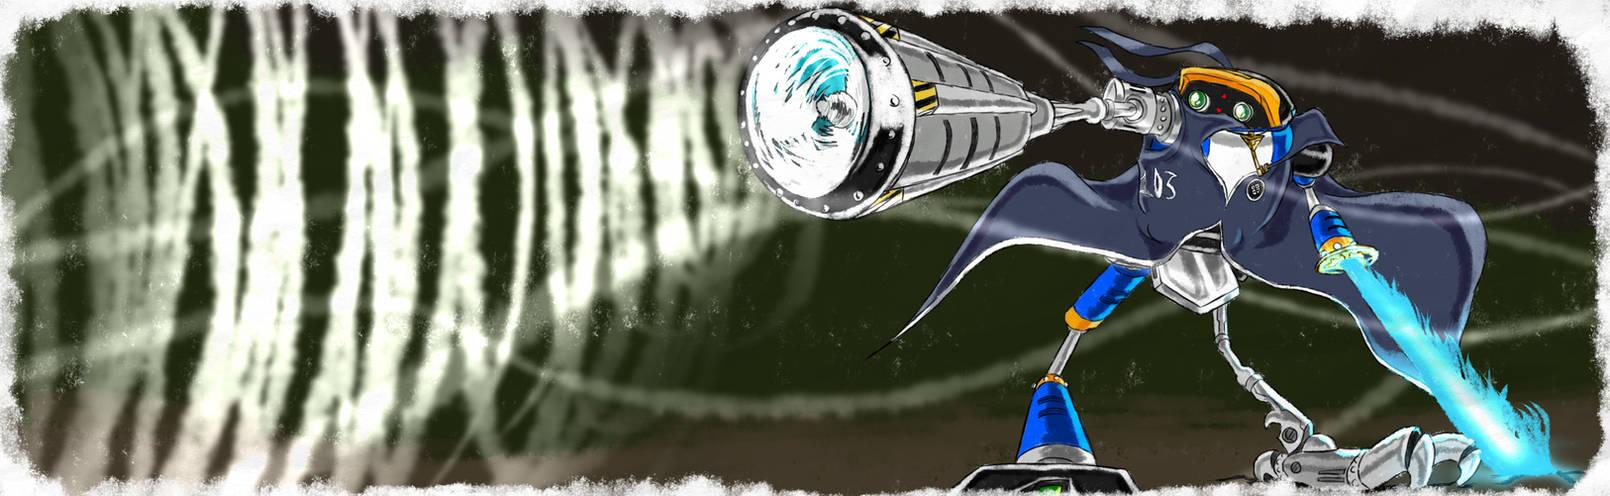 E-103 Delta Redesign - SA1 Remake Fan Concept Art